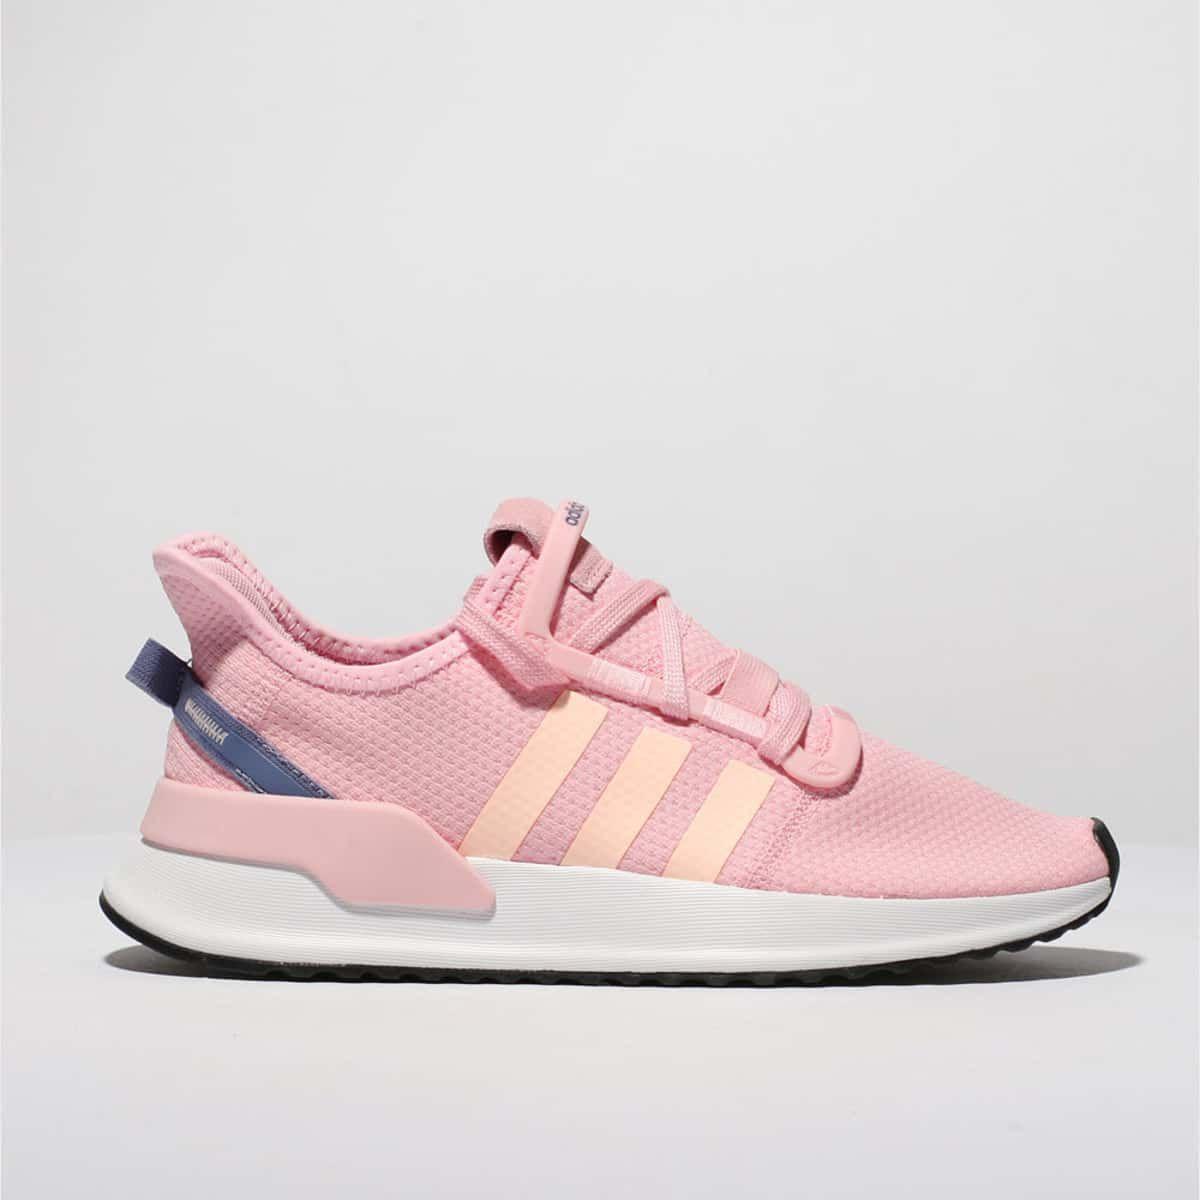 pink adidas ladies trainers off 67% - www.usushimd.com